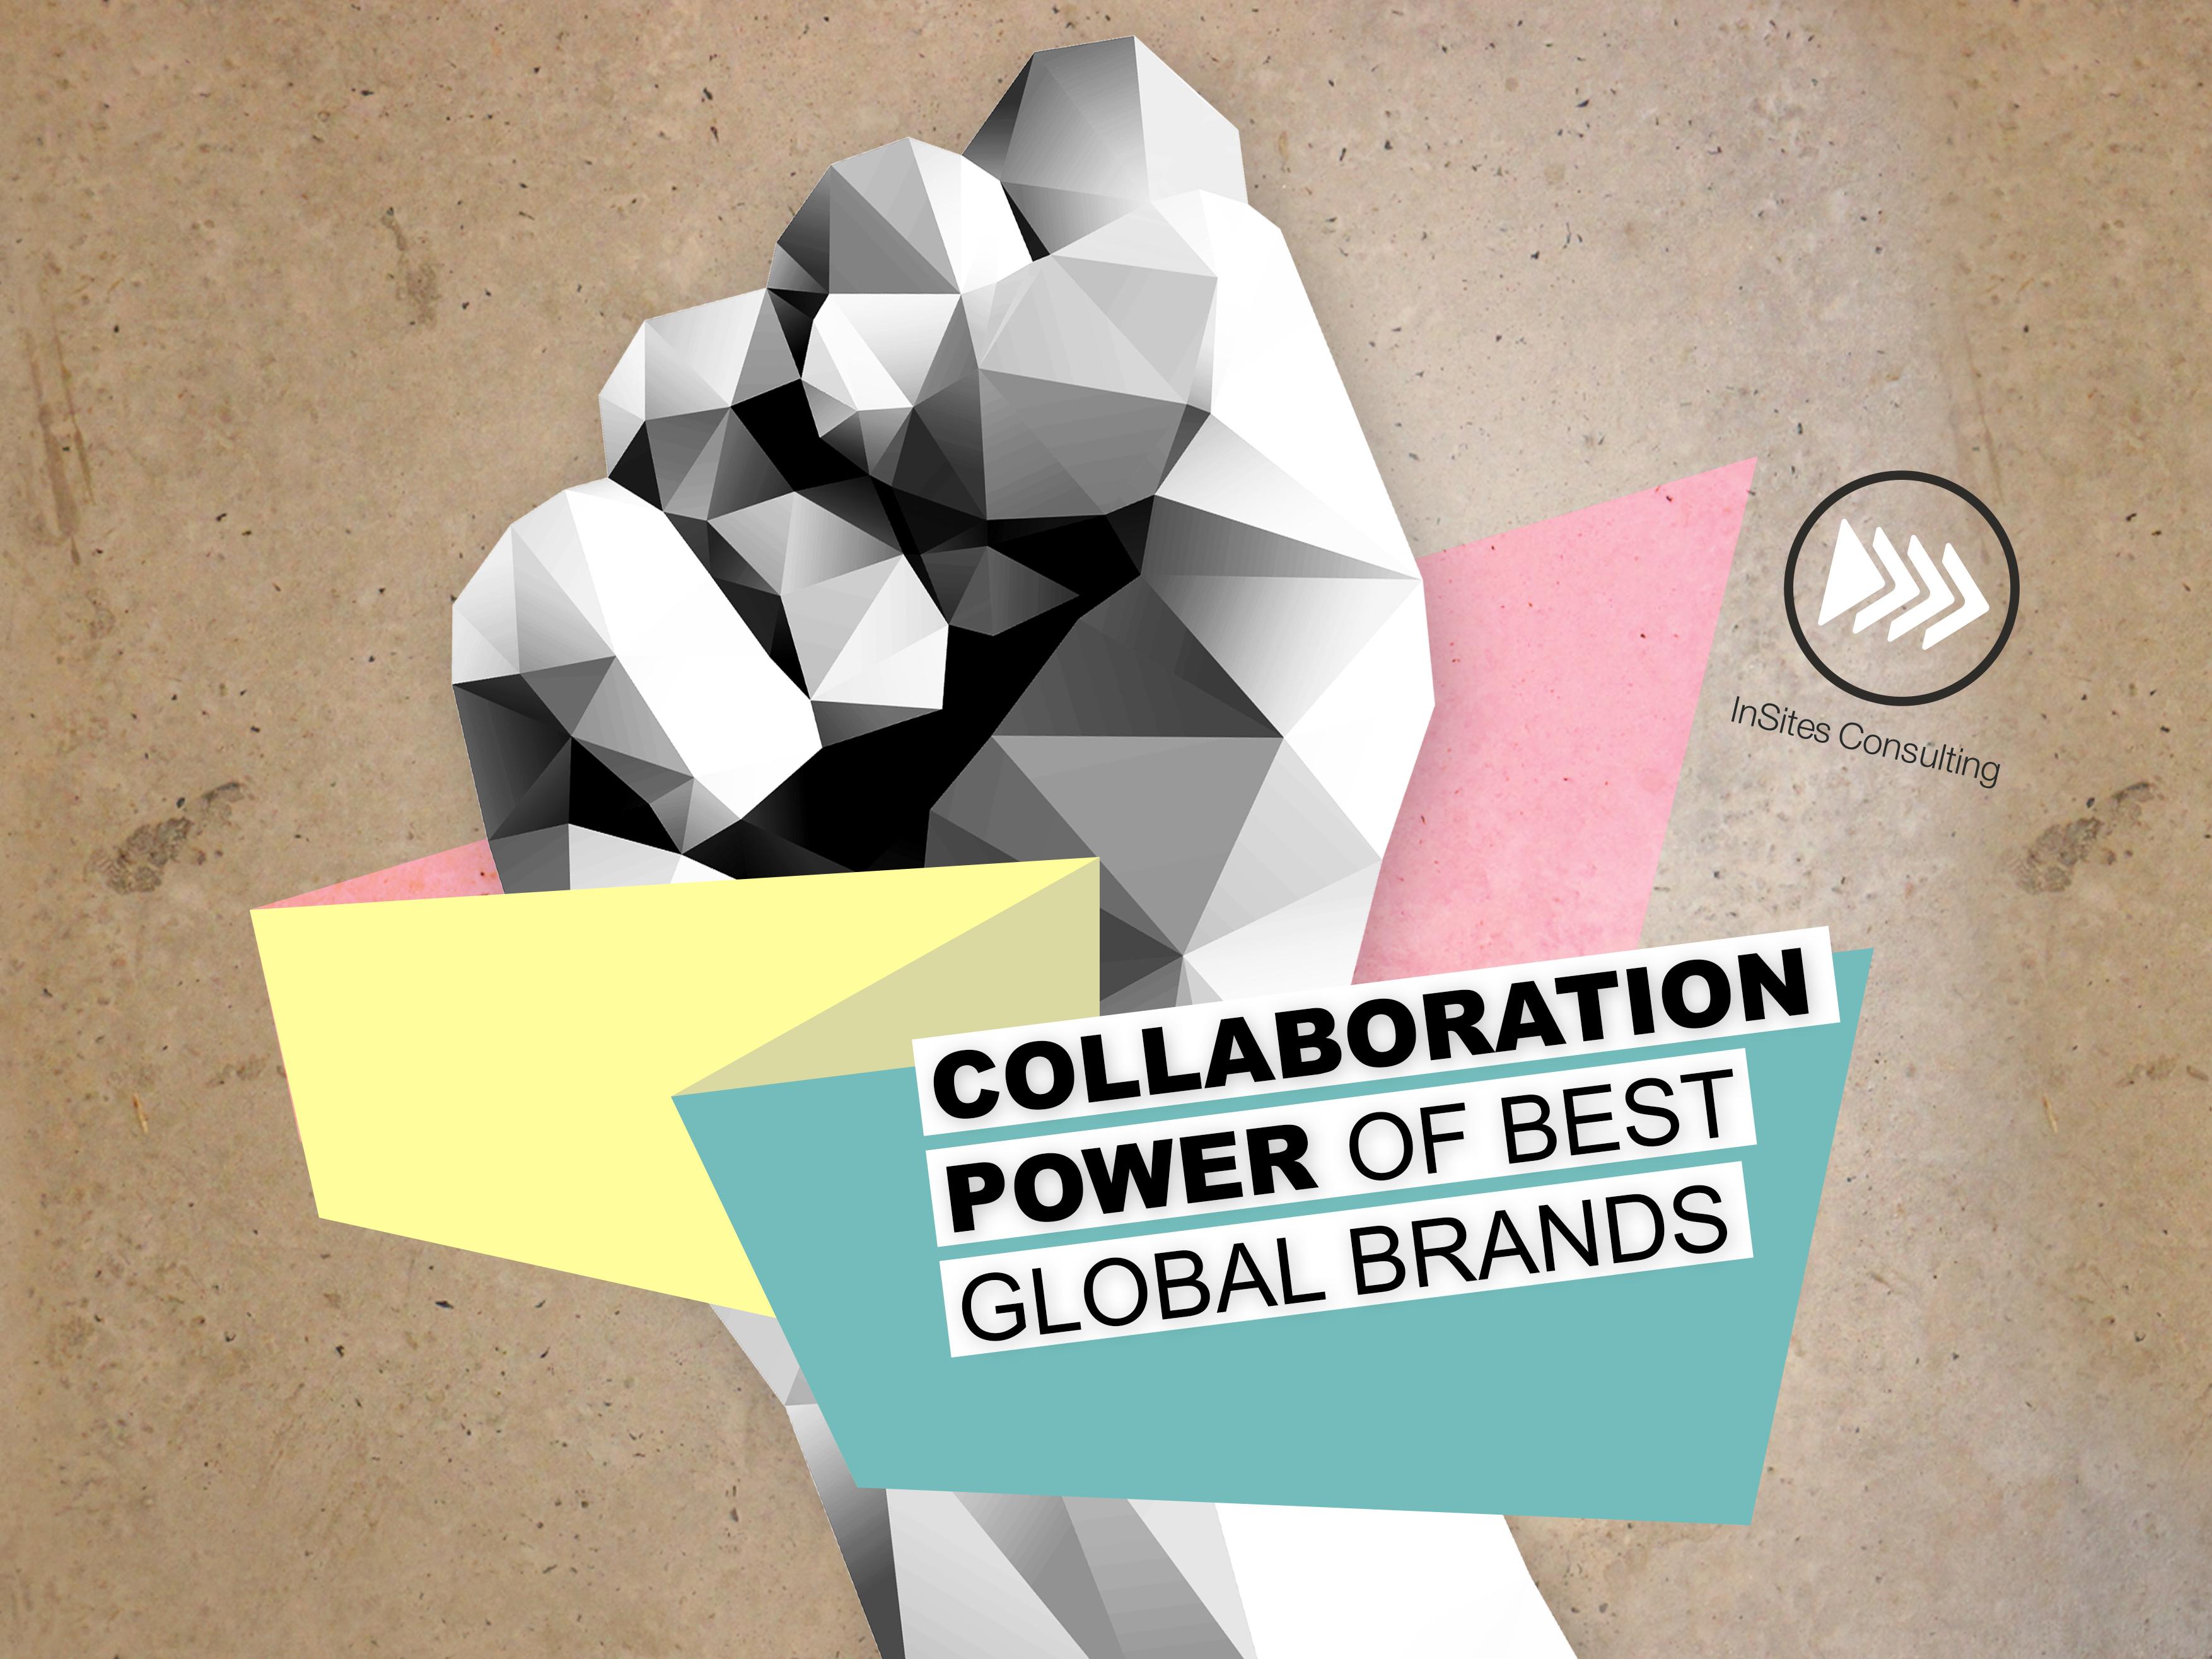 Brand Collaboration Power